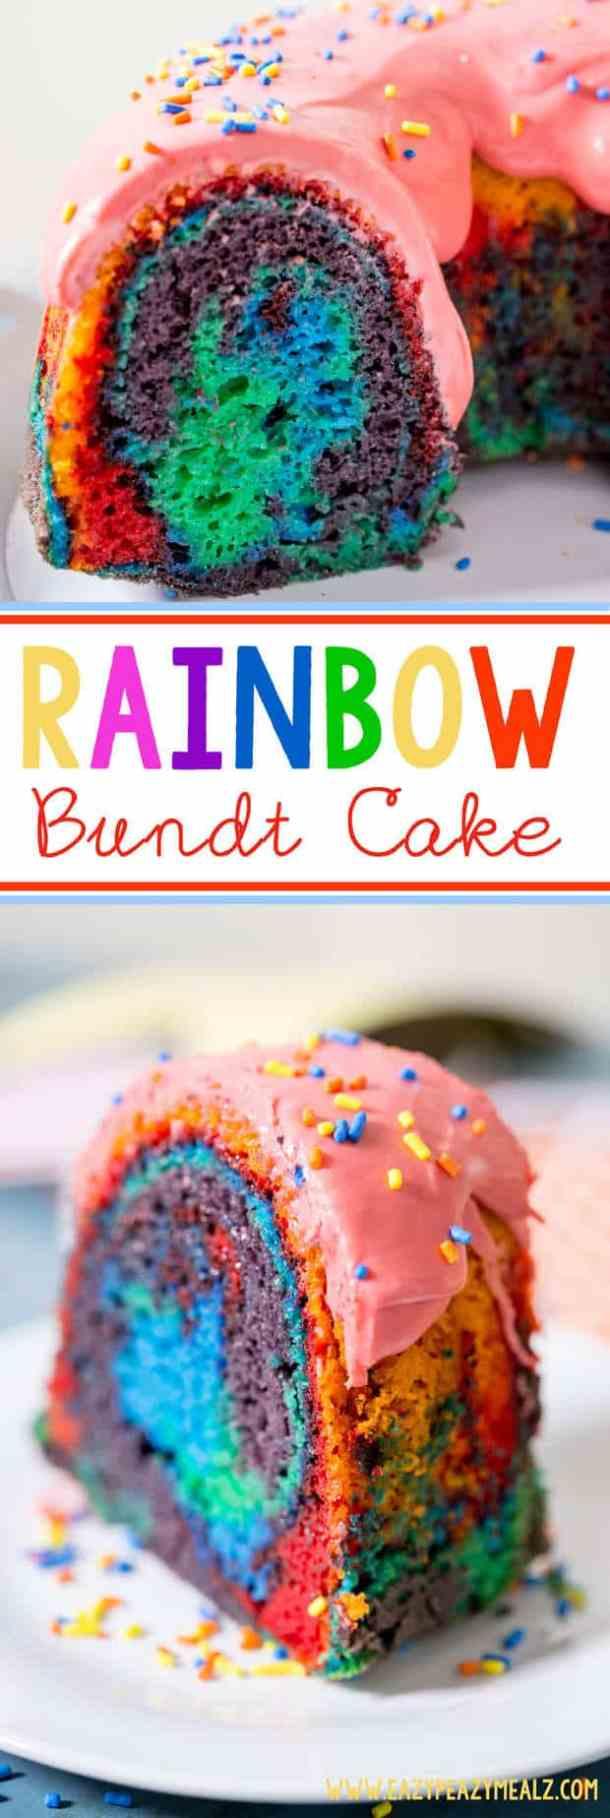 Rainbow Bundt Cake -- part of 14 OF THE BEST BUNDT CAKE RECIPES